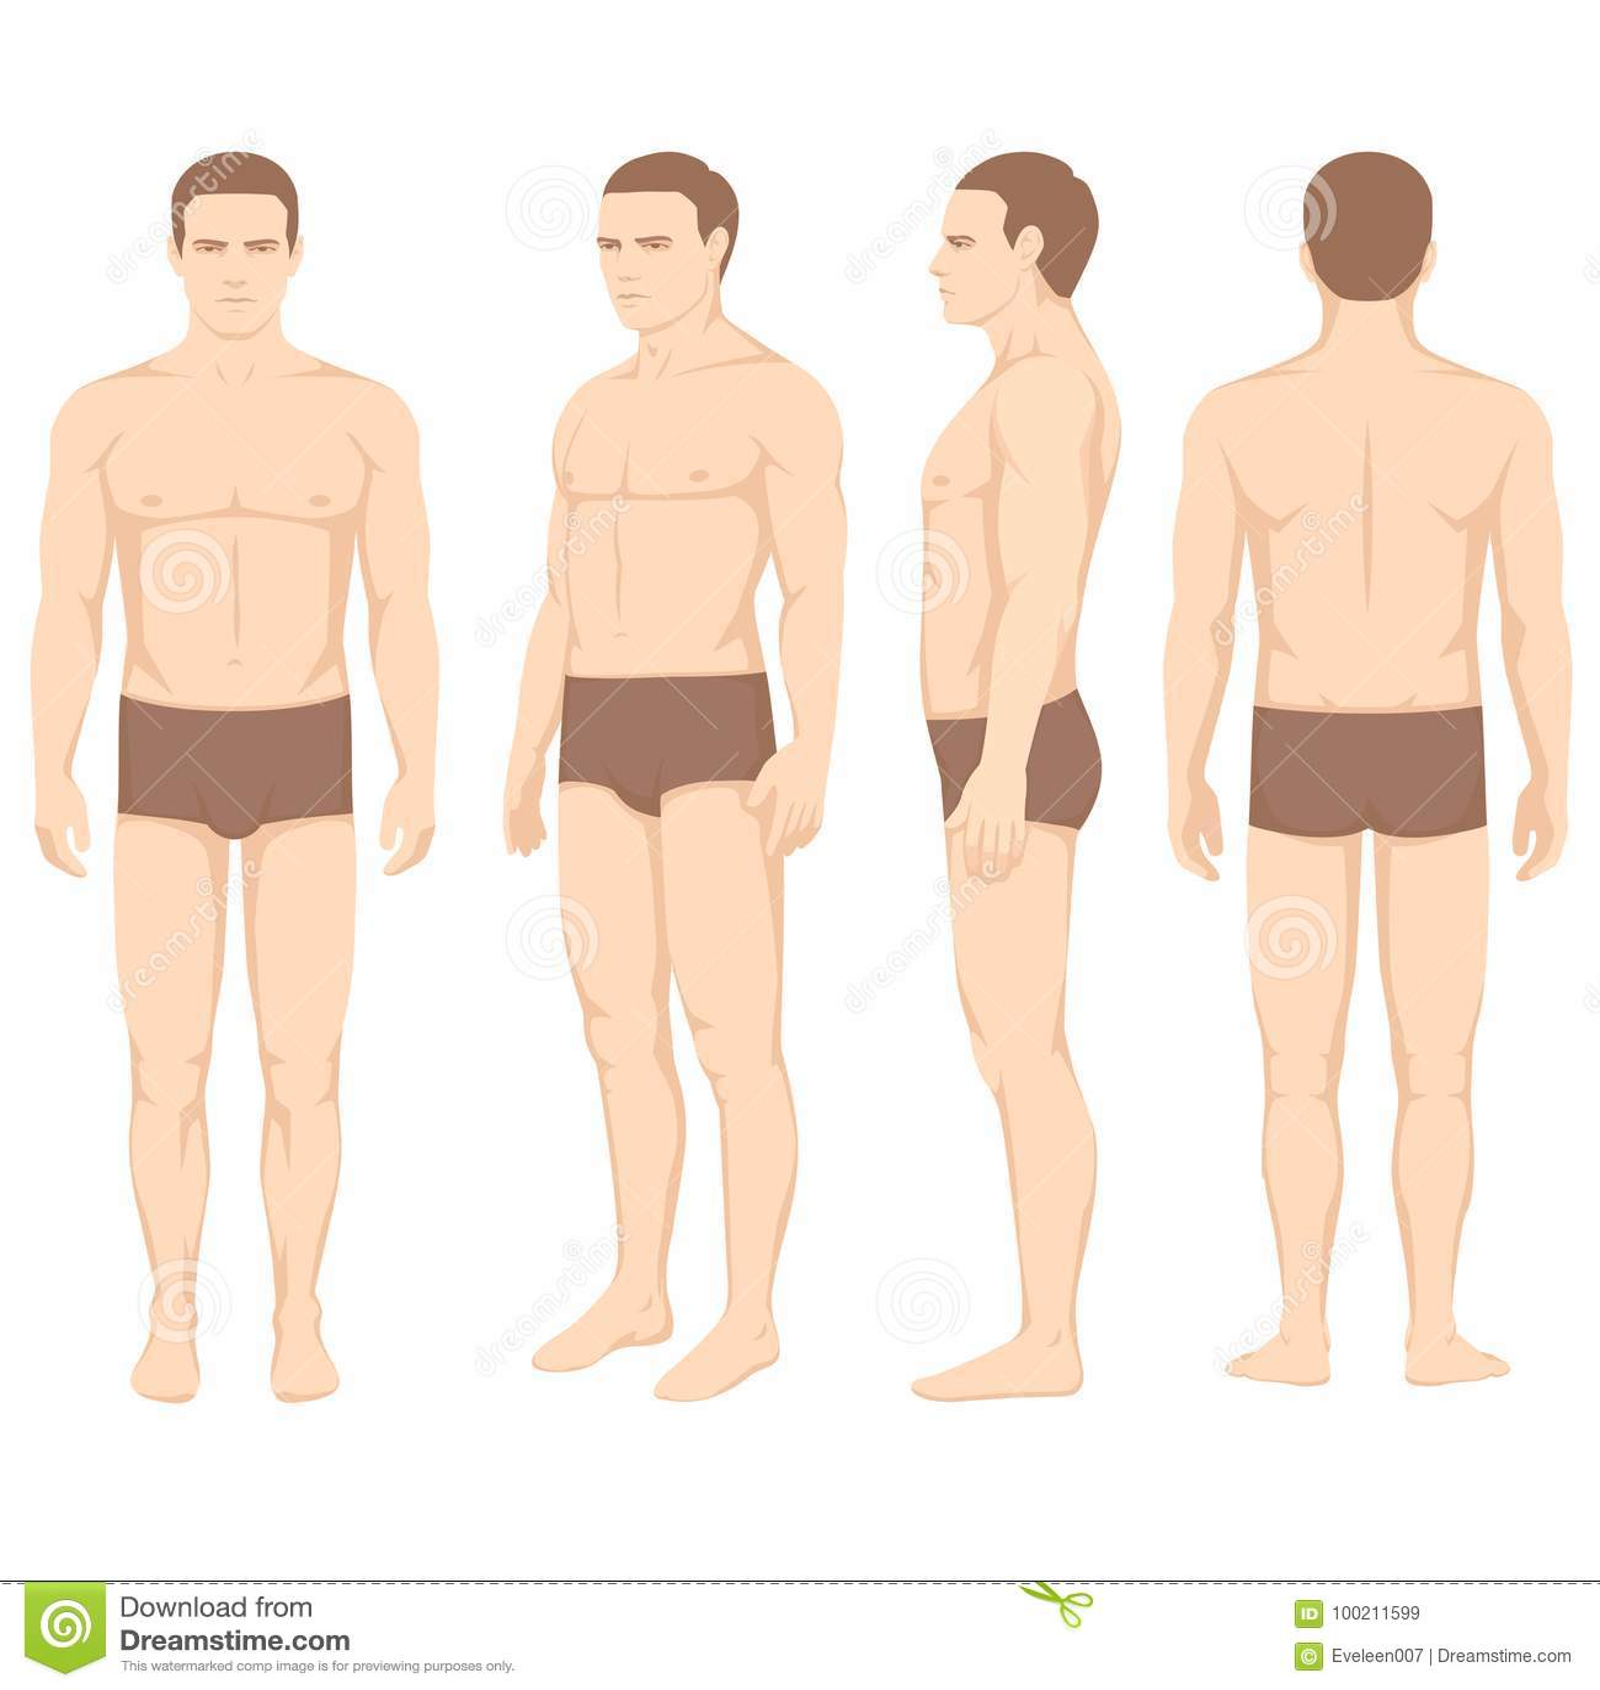 Man anatomy body